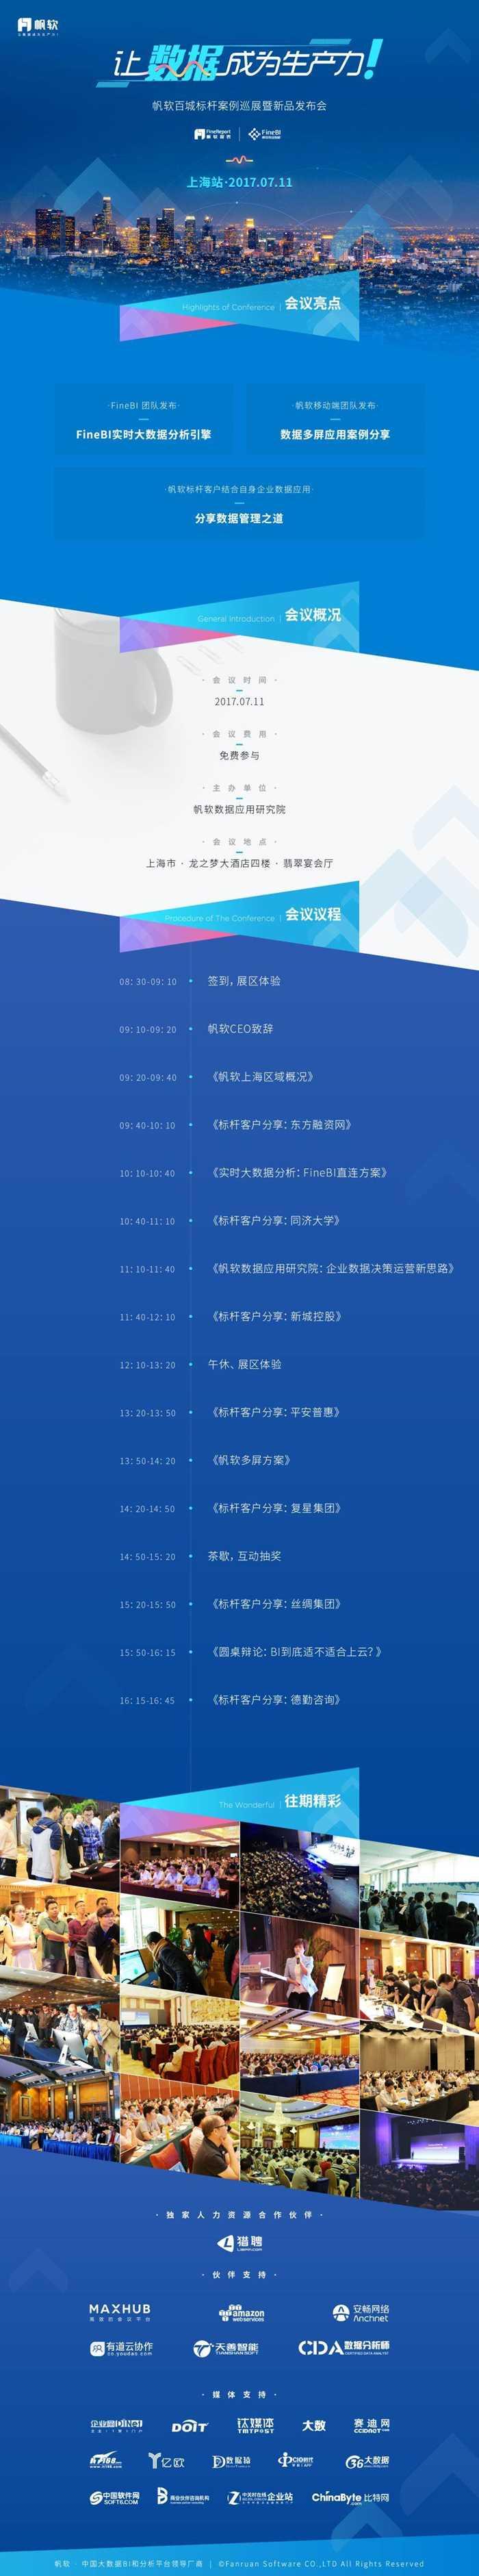 web邀请_上海站_800x4300@2x.jpg